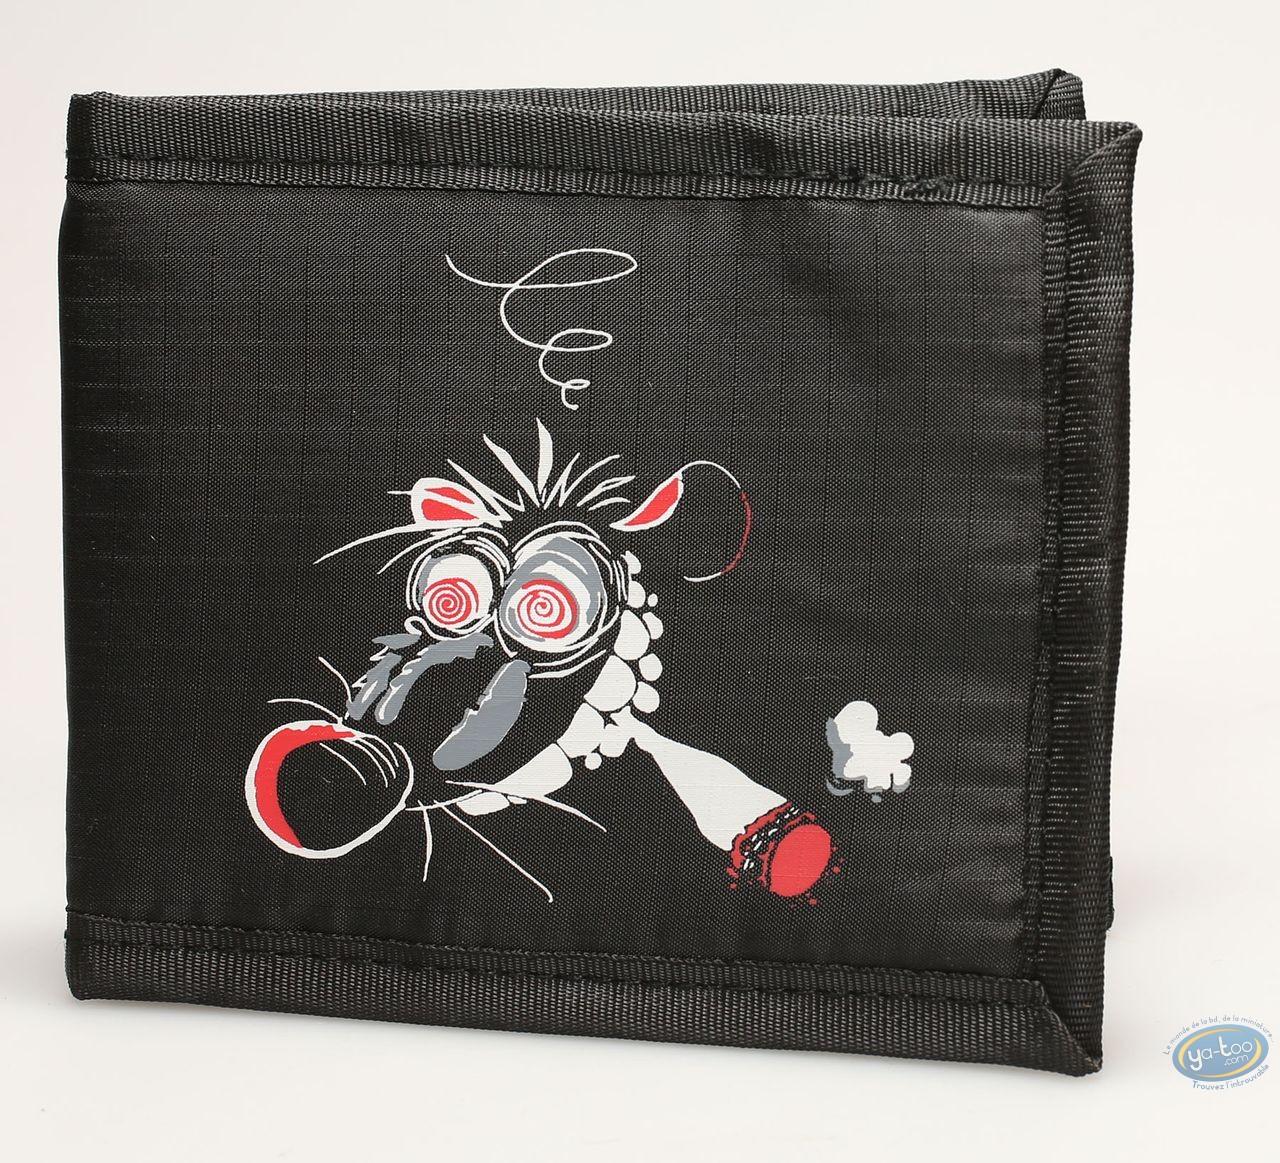 Luggage, Pacush Blues - Les rats : Wallet, P'titluc, Les rats : Smoking